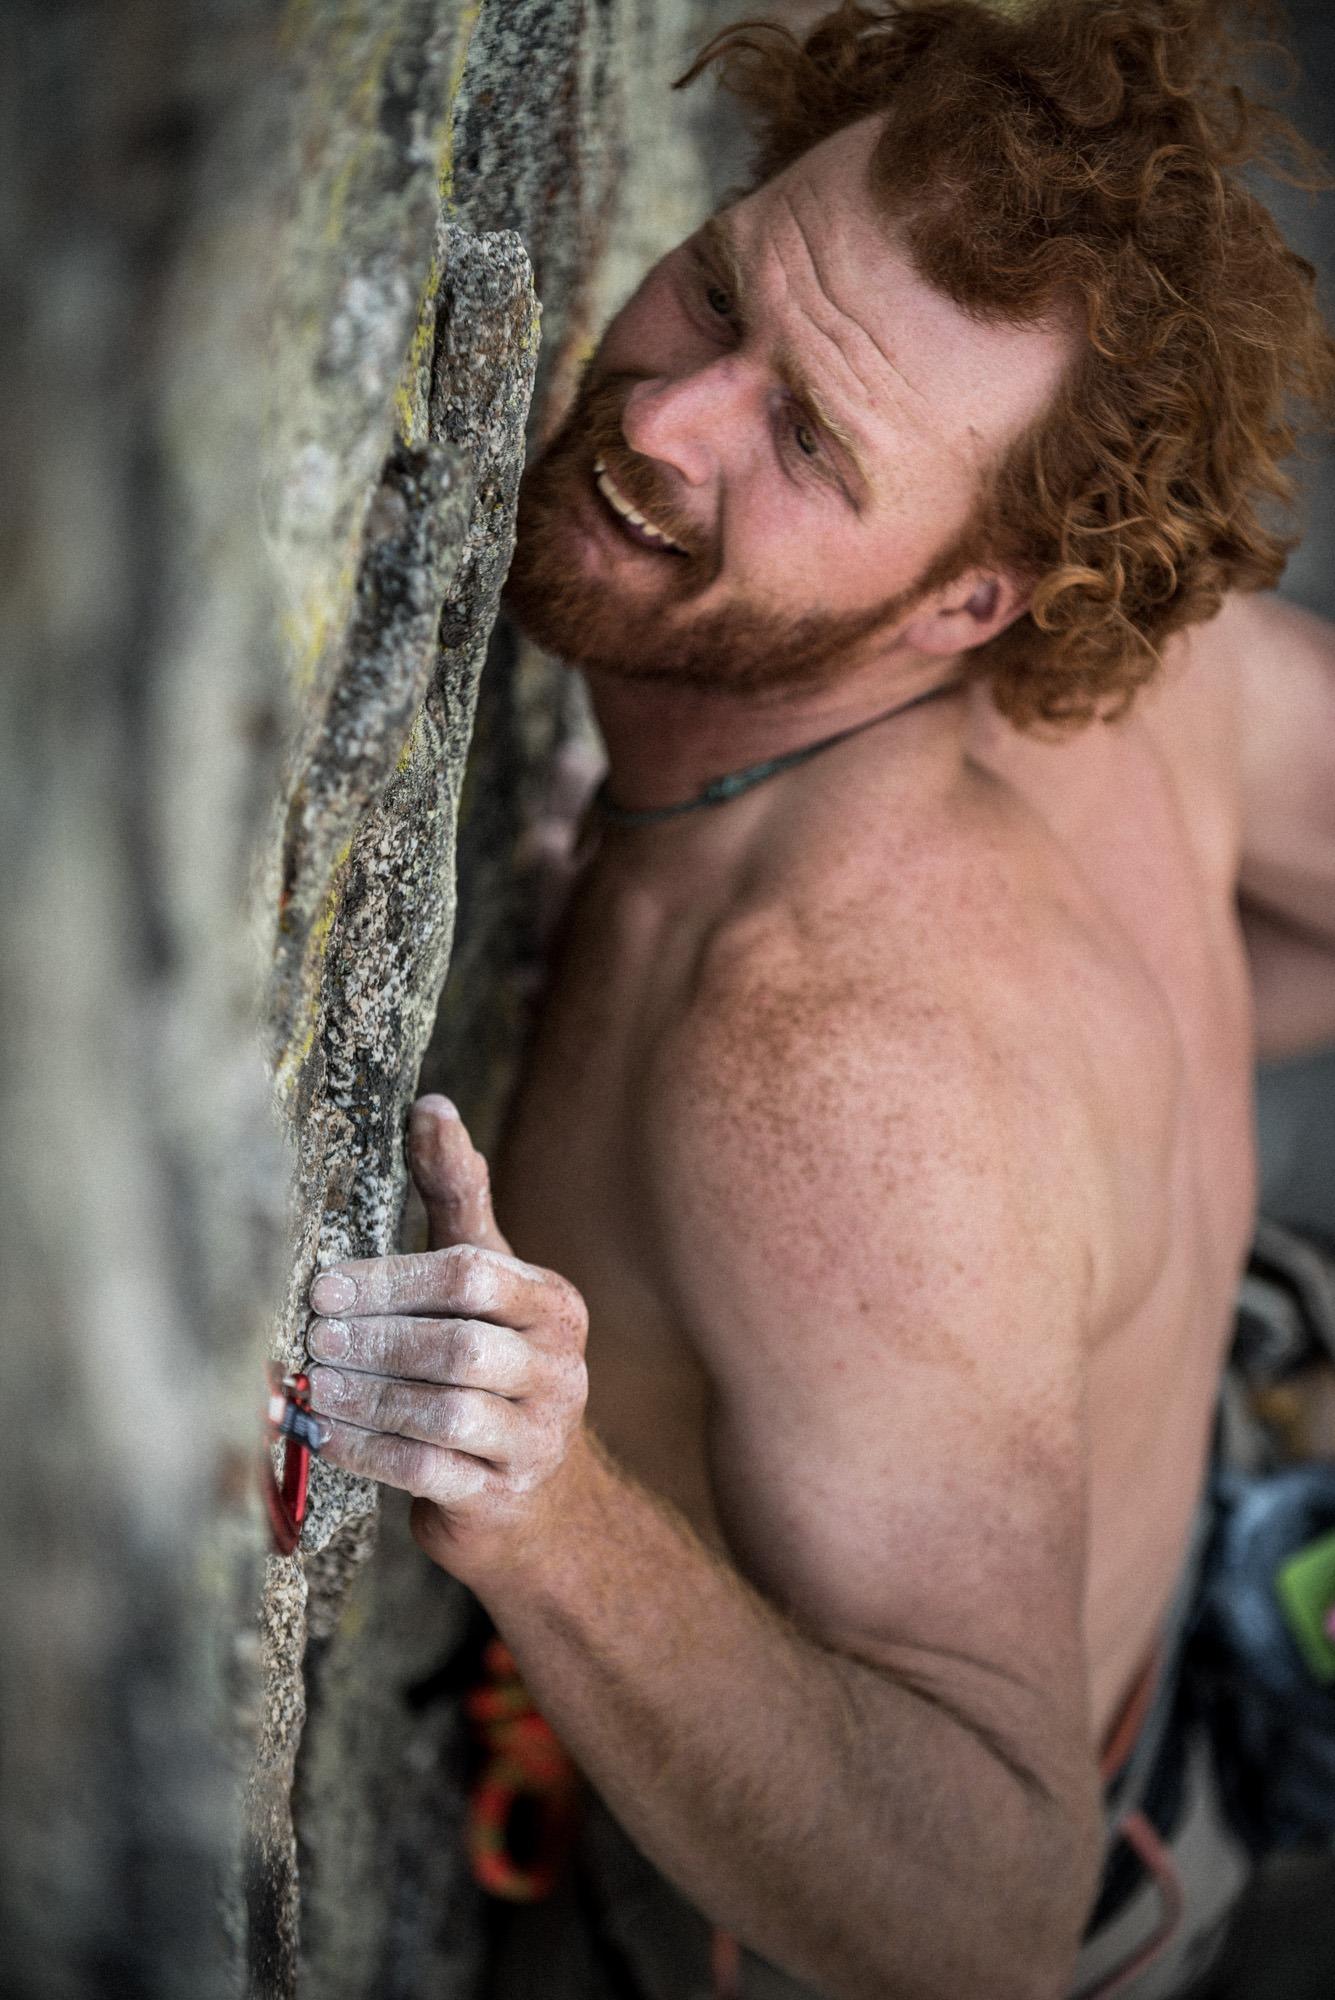 Wade Meade rock climbing.